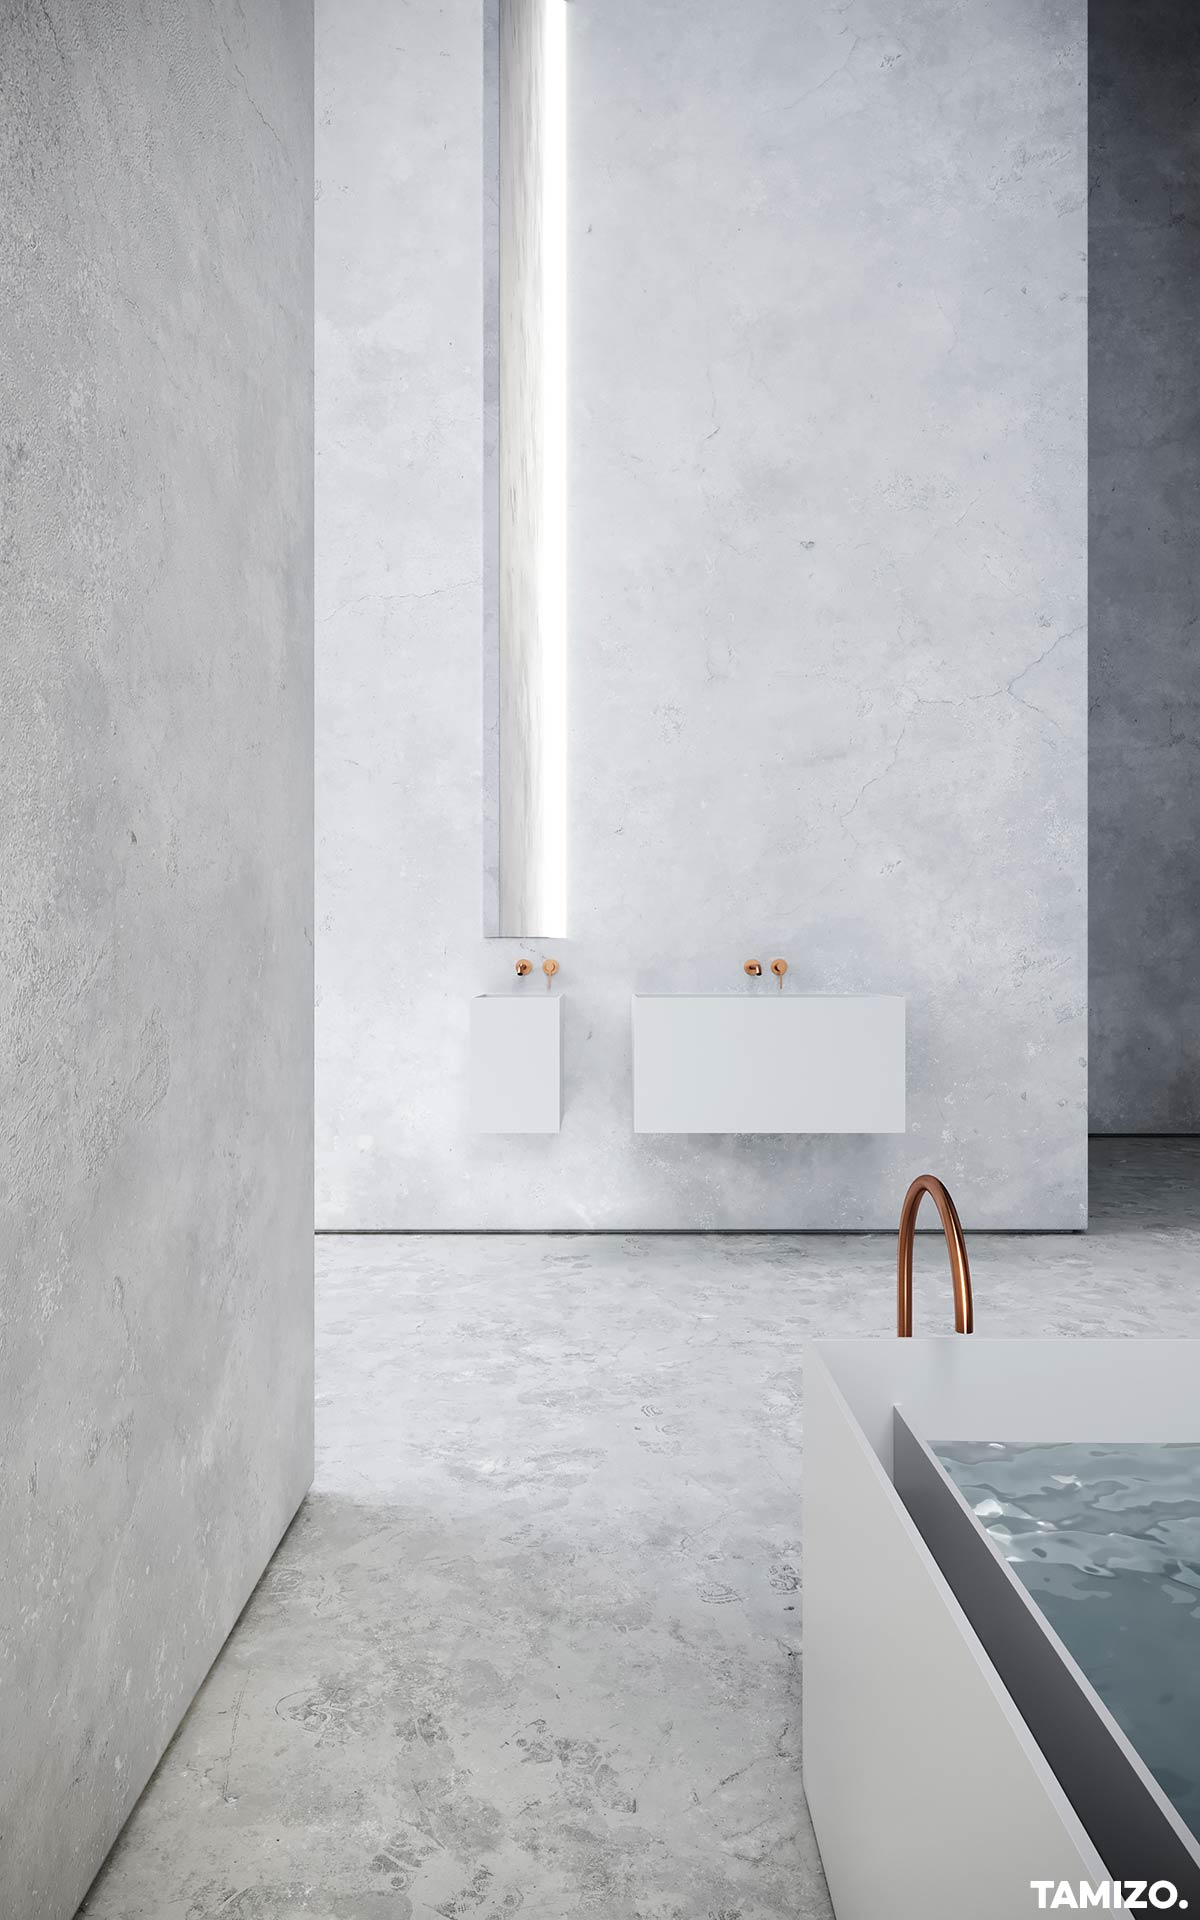 minimall_minimallone_ontheedge_bathroom_bathtub_washbasin_industrial_design_project_07